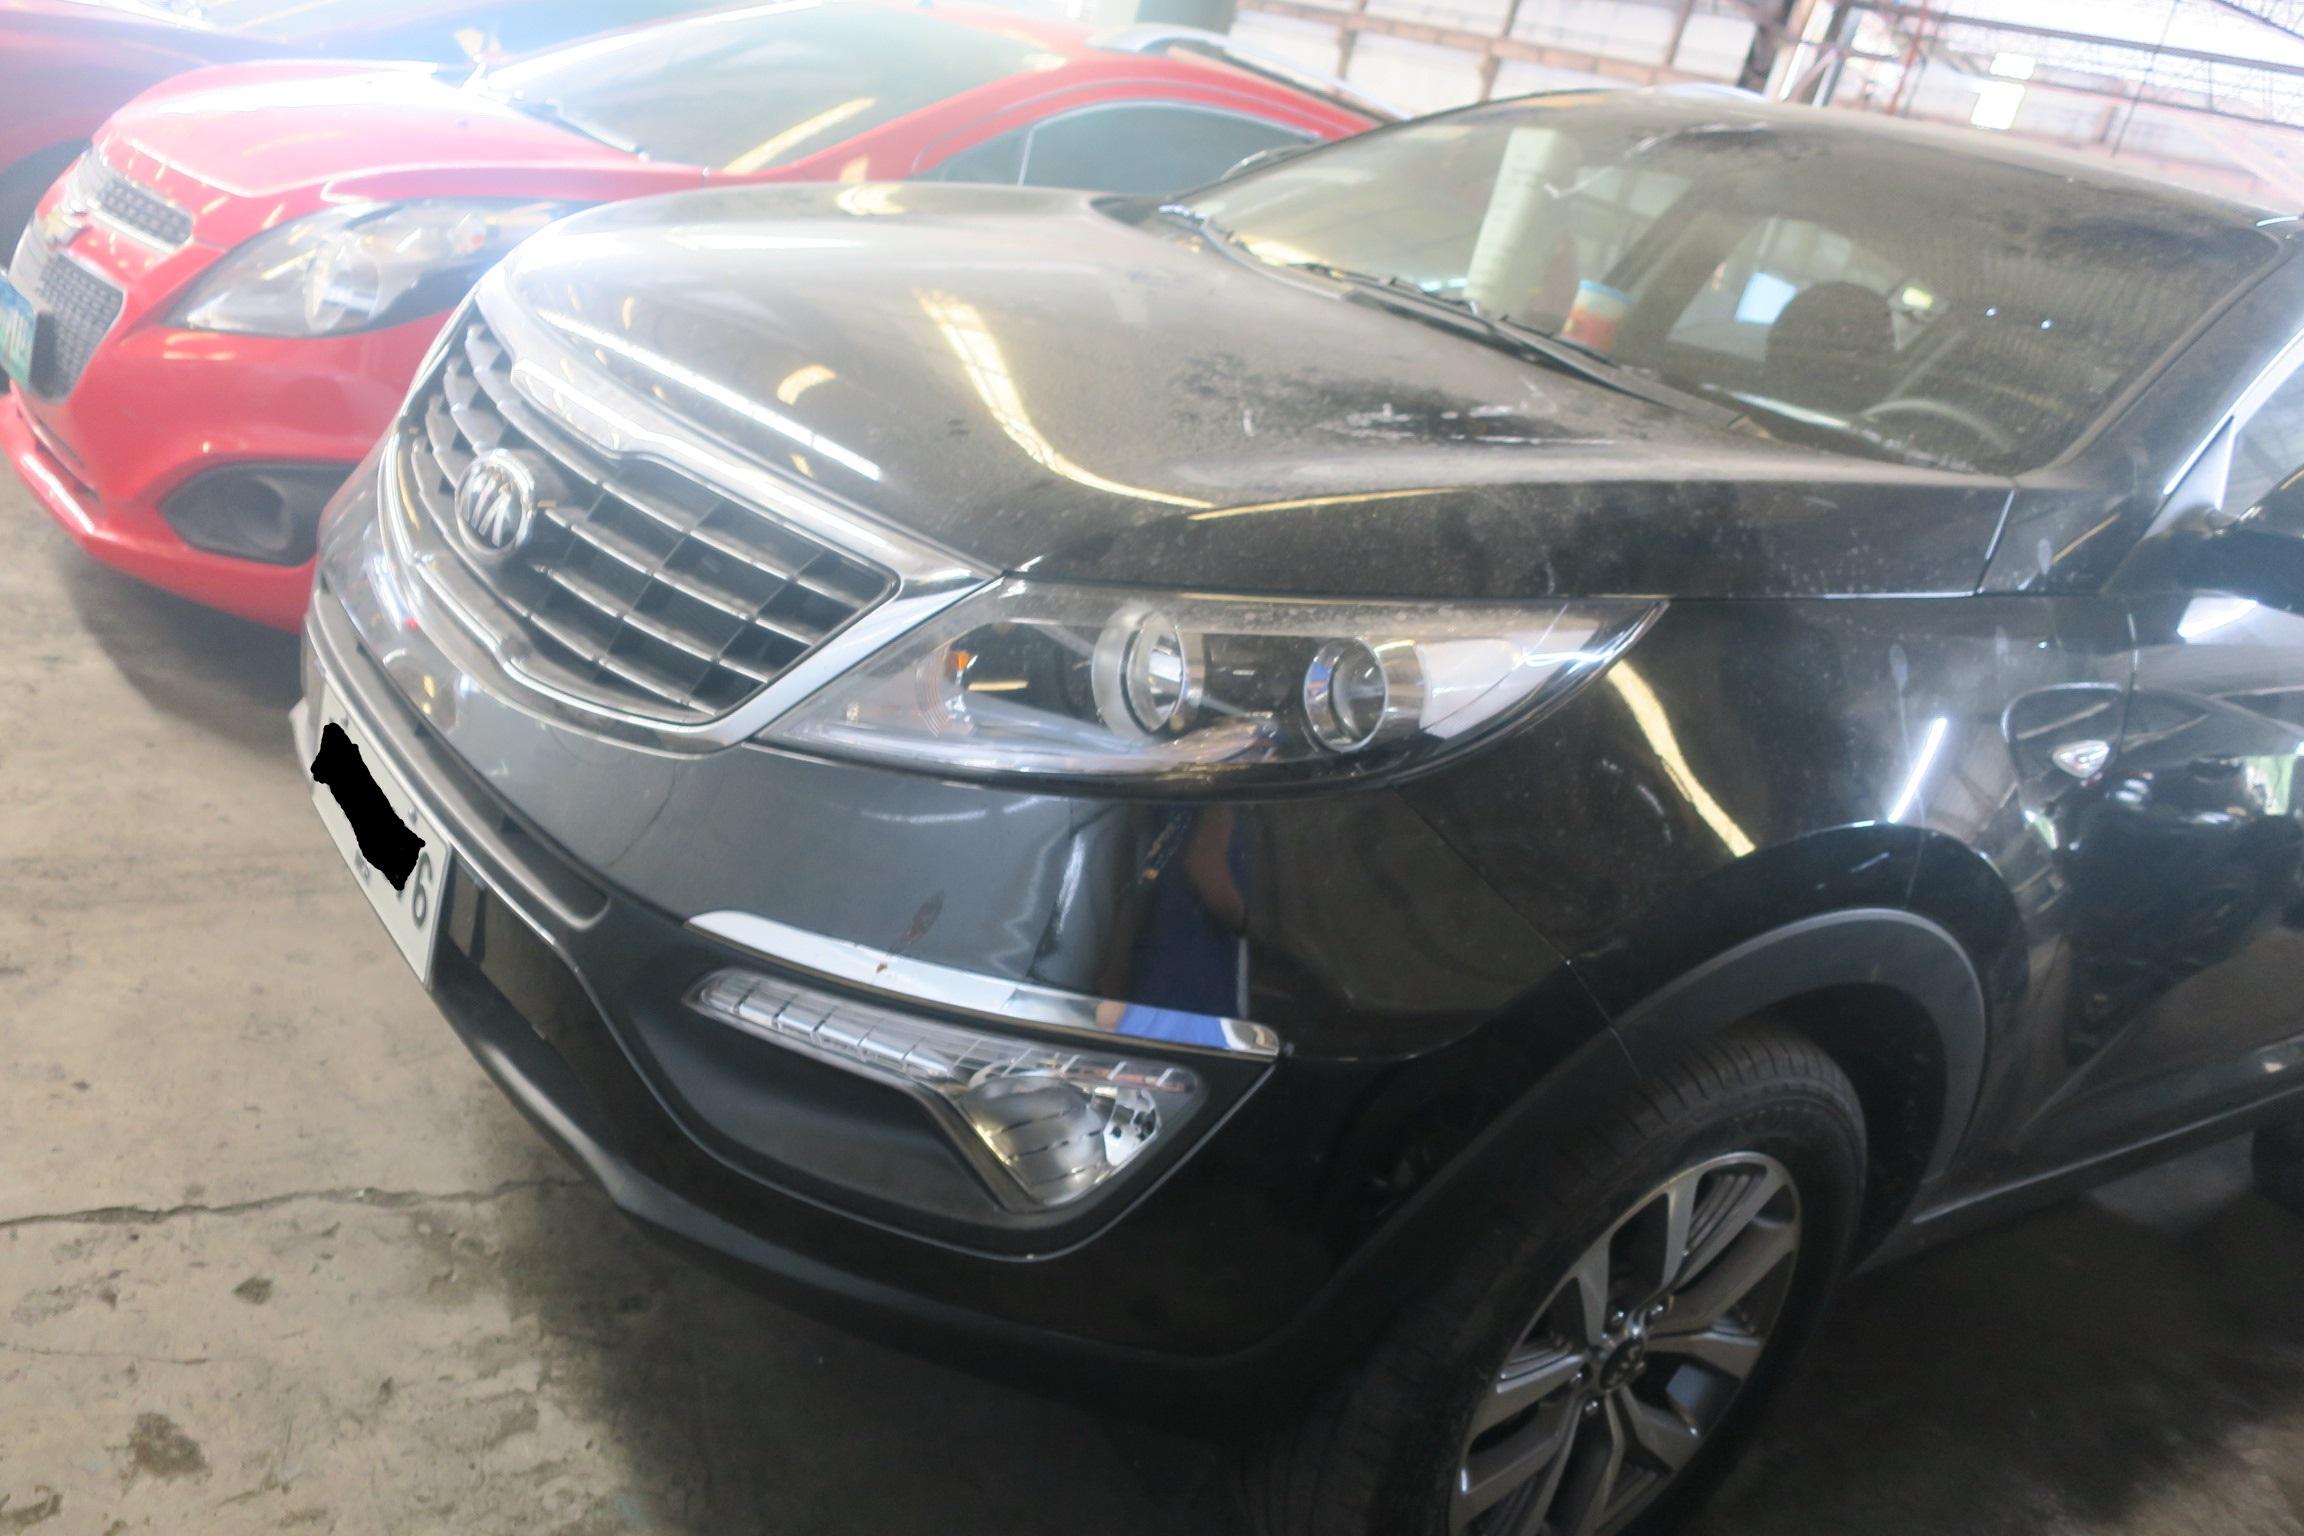 Toyota yaris 1 3 e mt 2017 philippines price amp specs autodeal - Feature